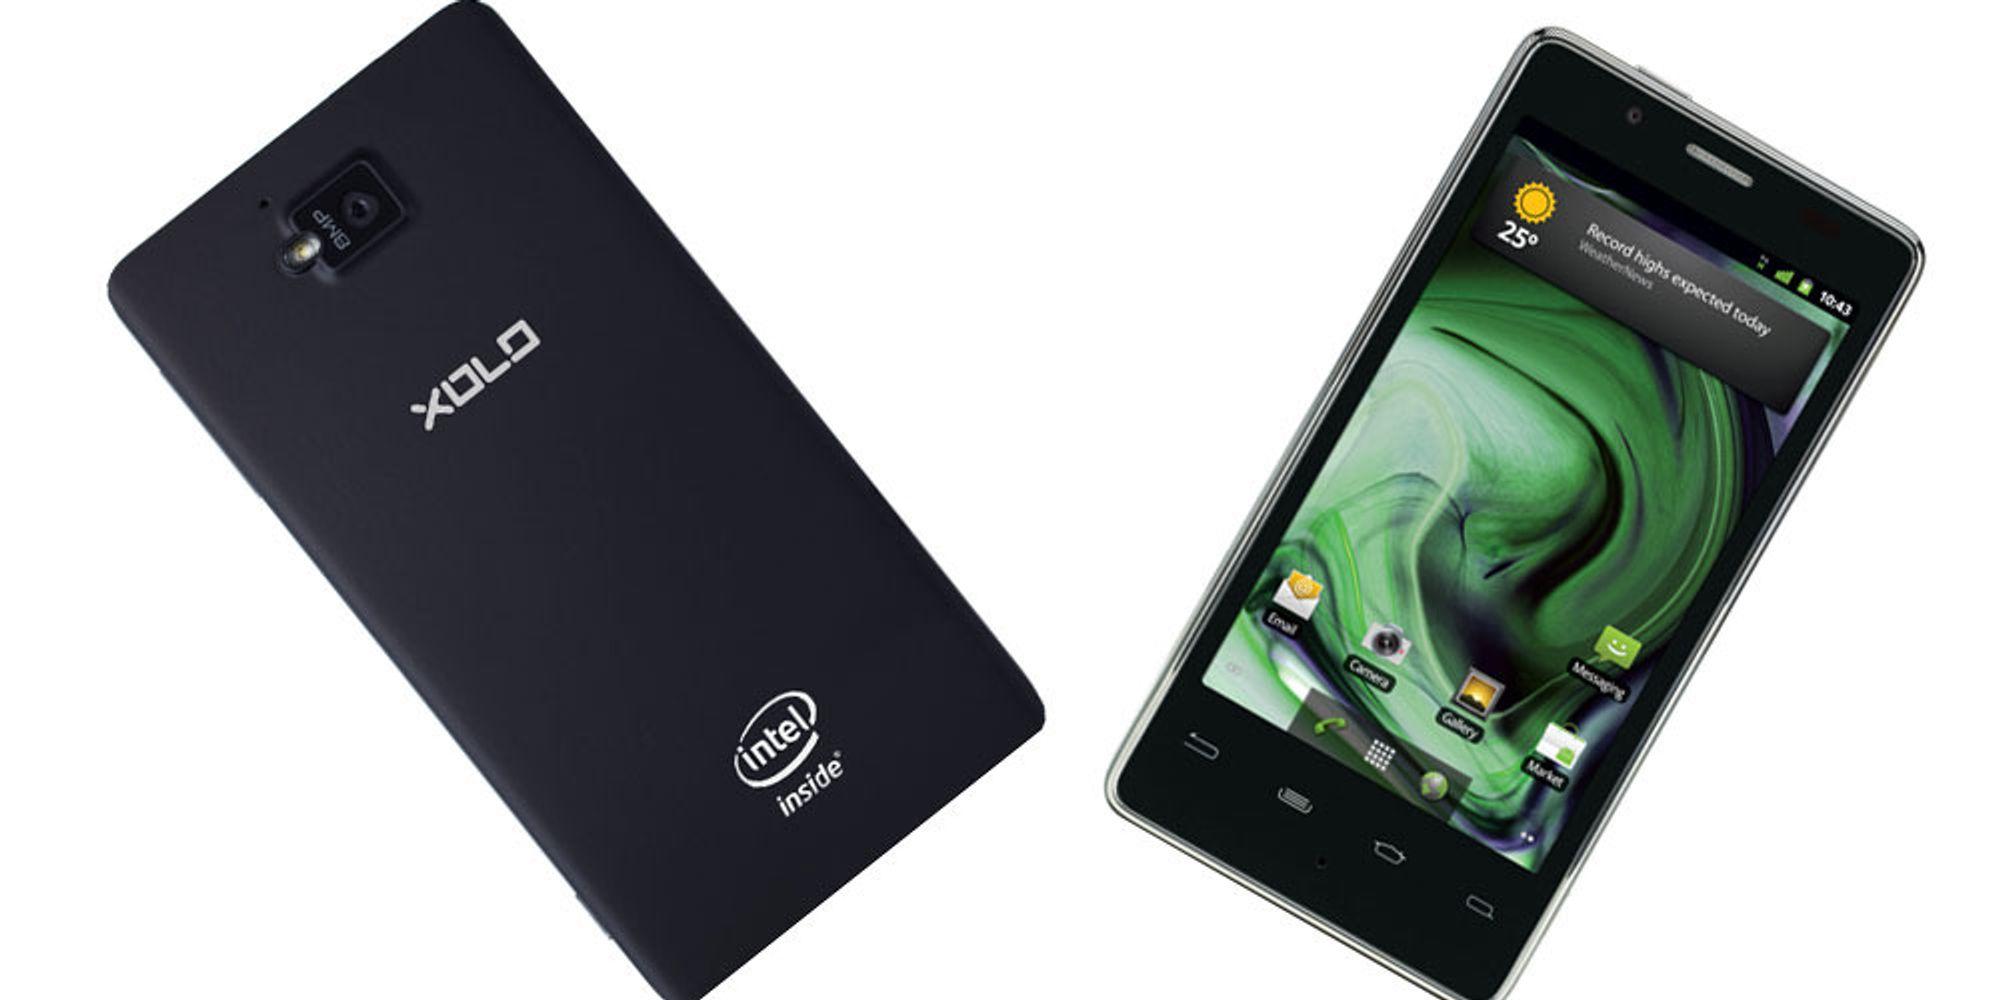 Intel-mobilen lanseres i morgen